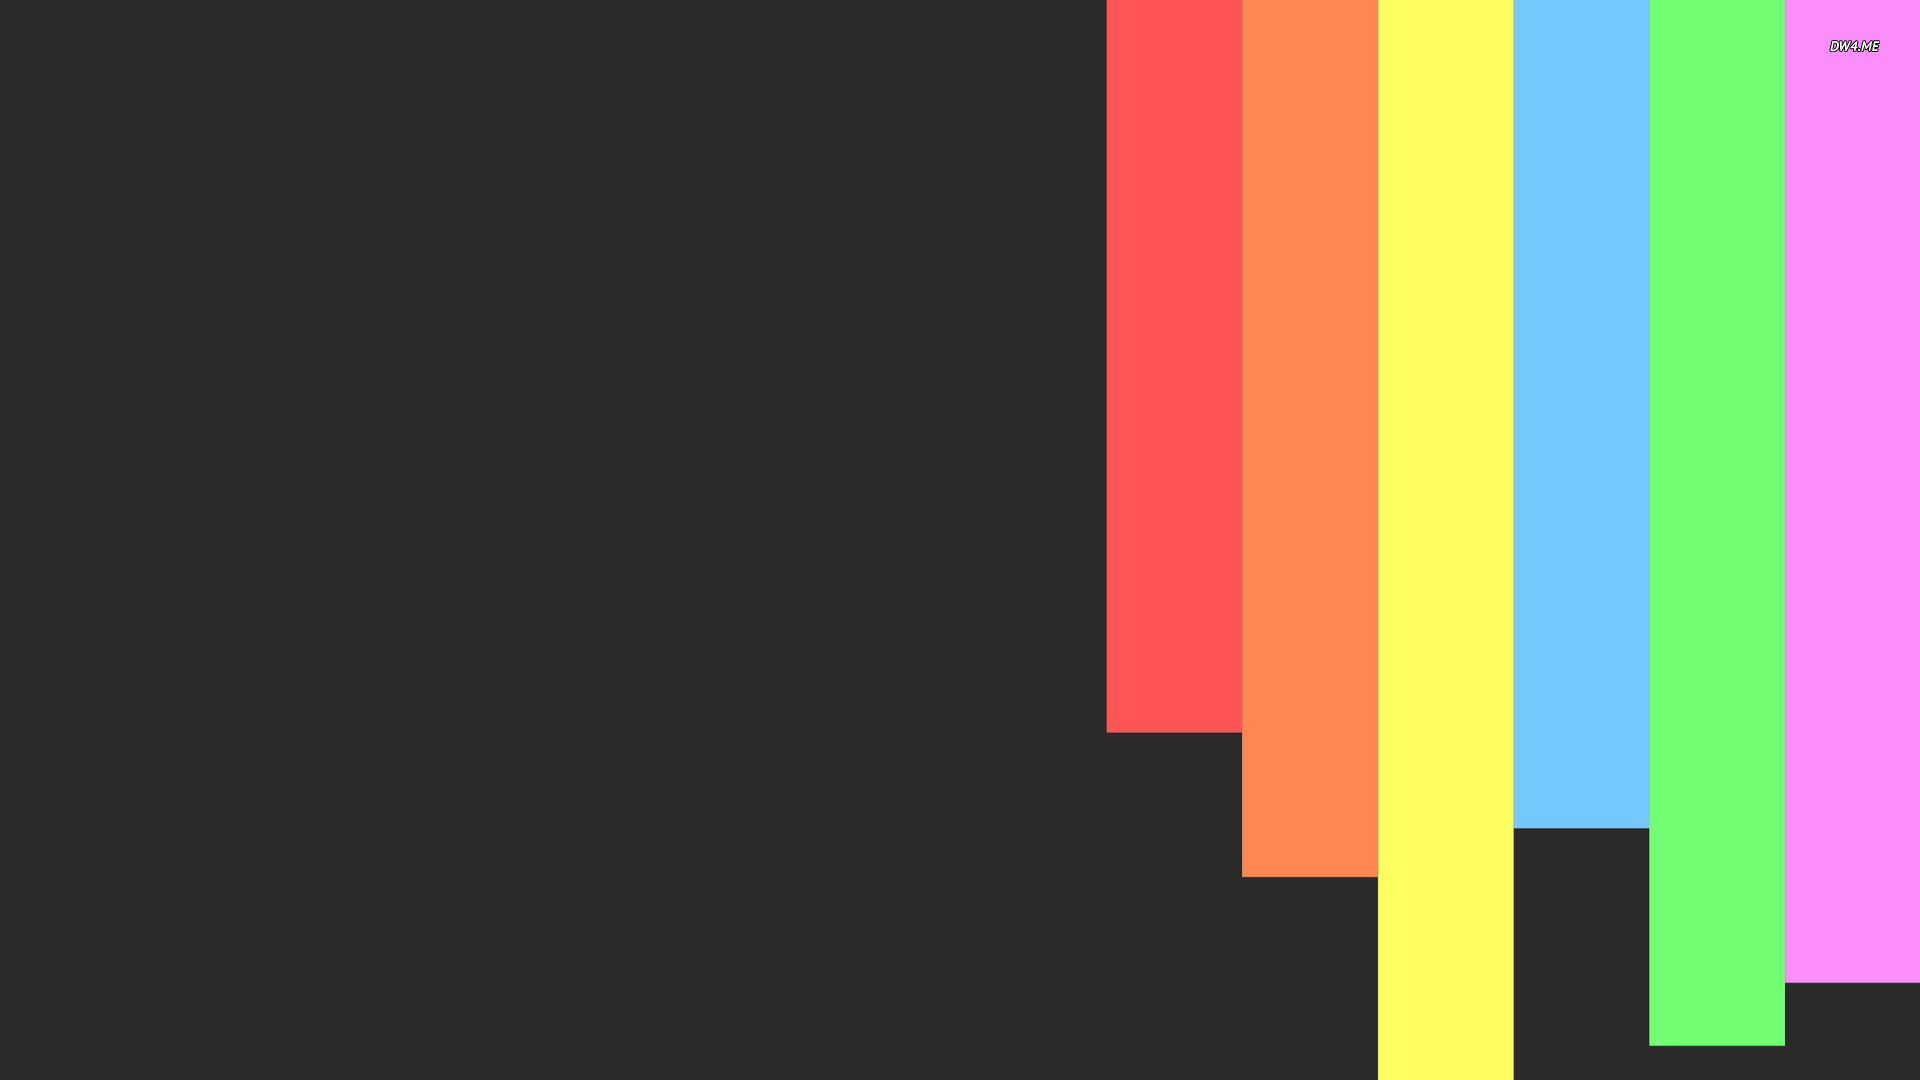 Heritage Rainbow Stripe Iphone X Iphone 8 Ios 11 Stock: Rainbow Stripes Wallpapers